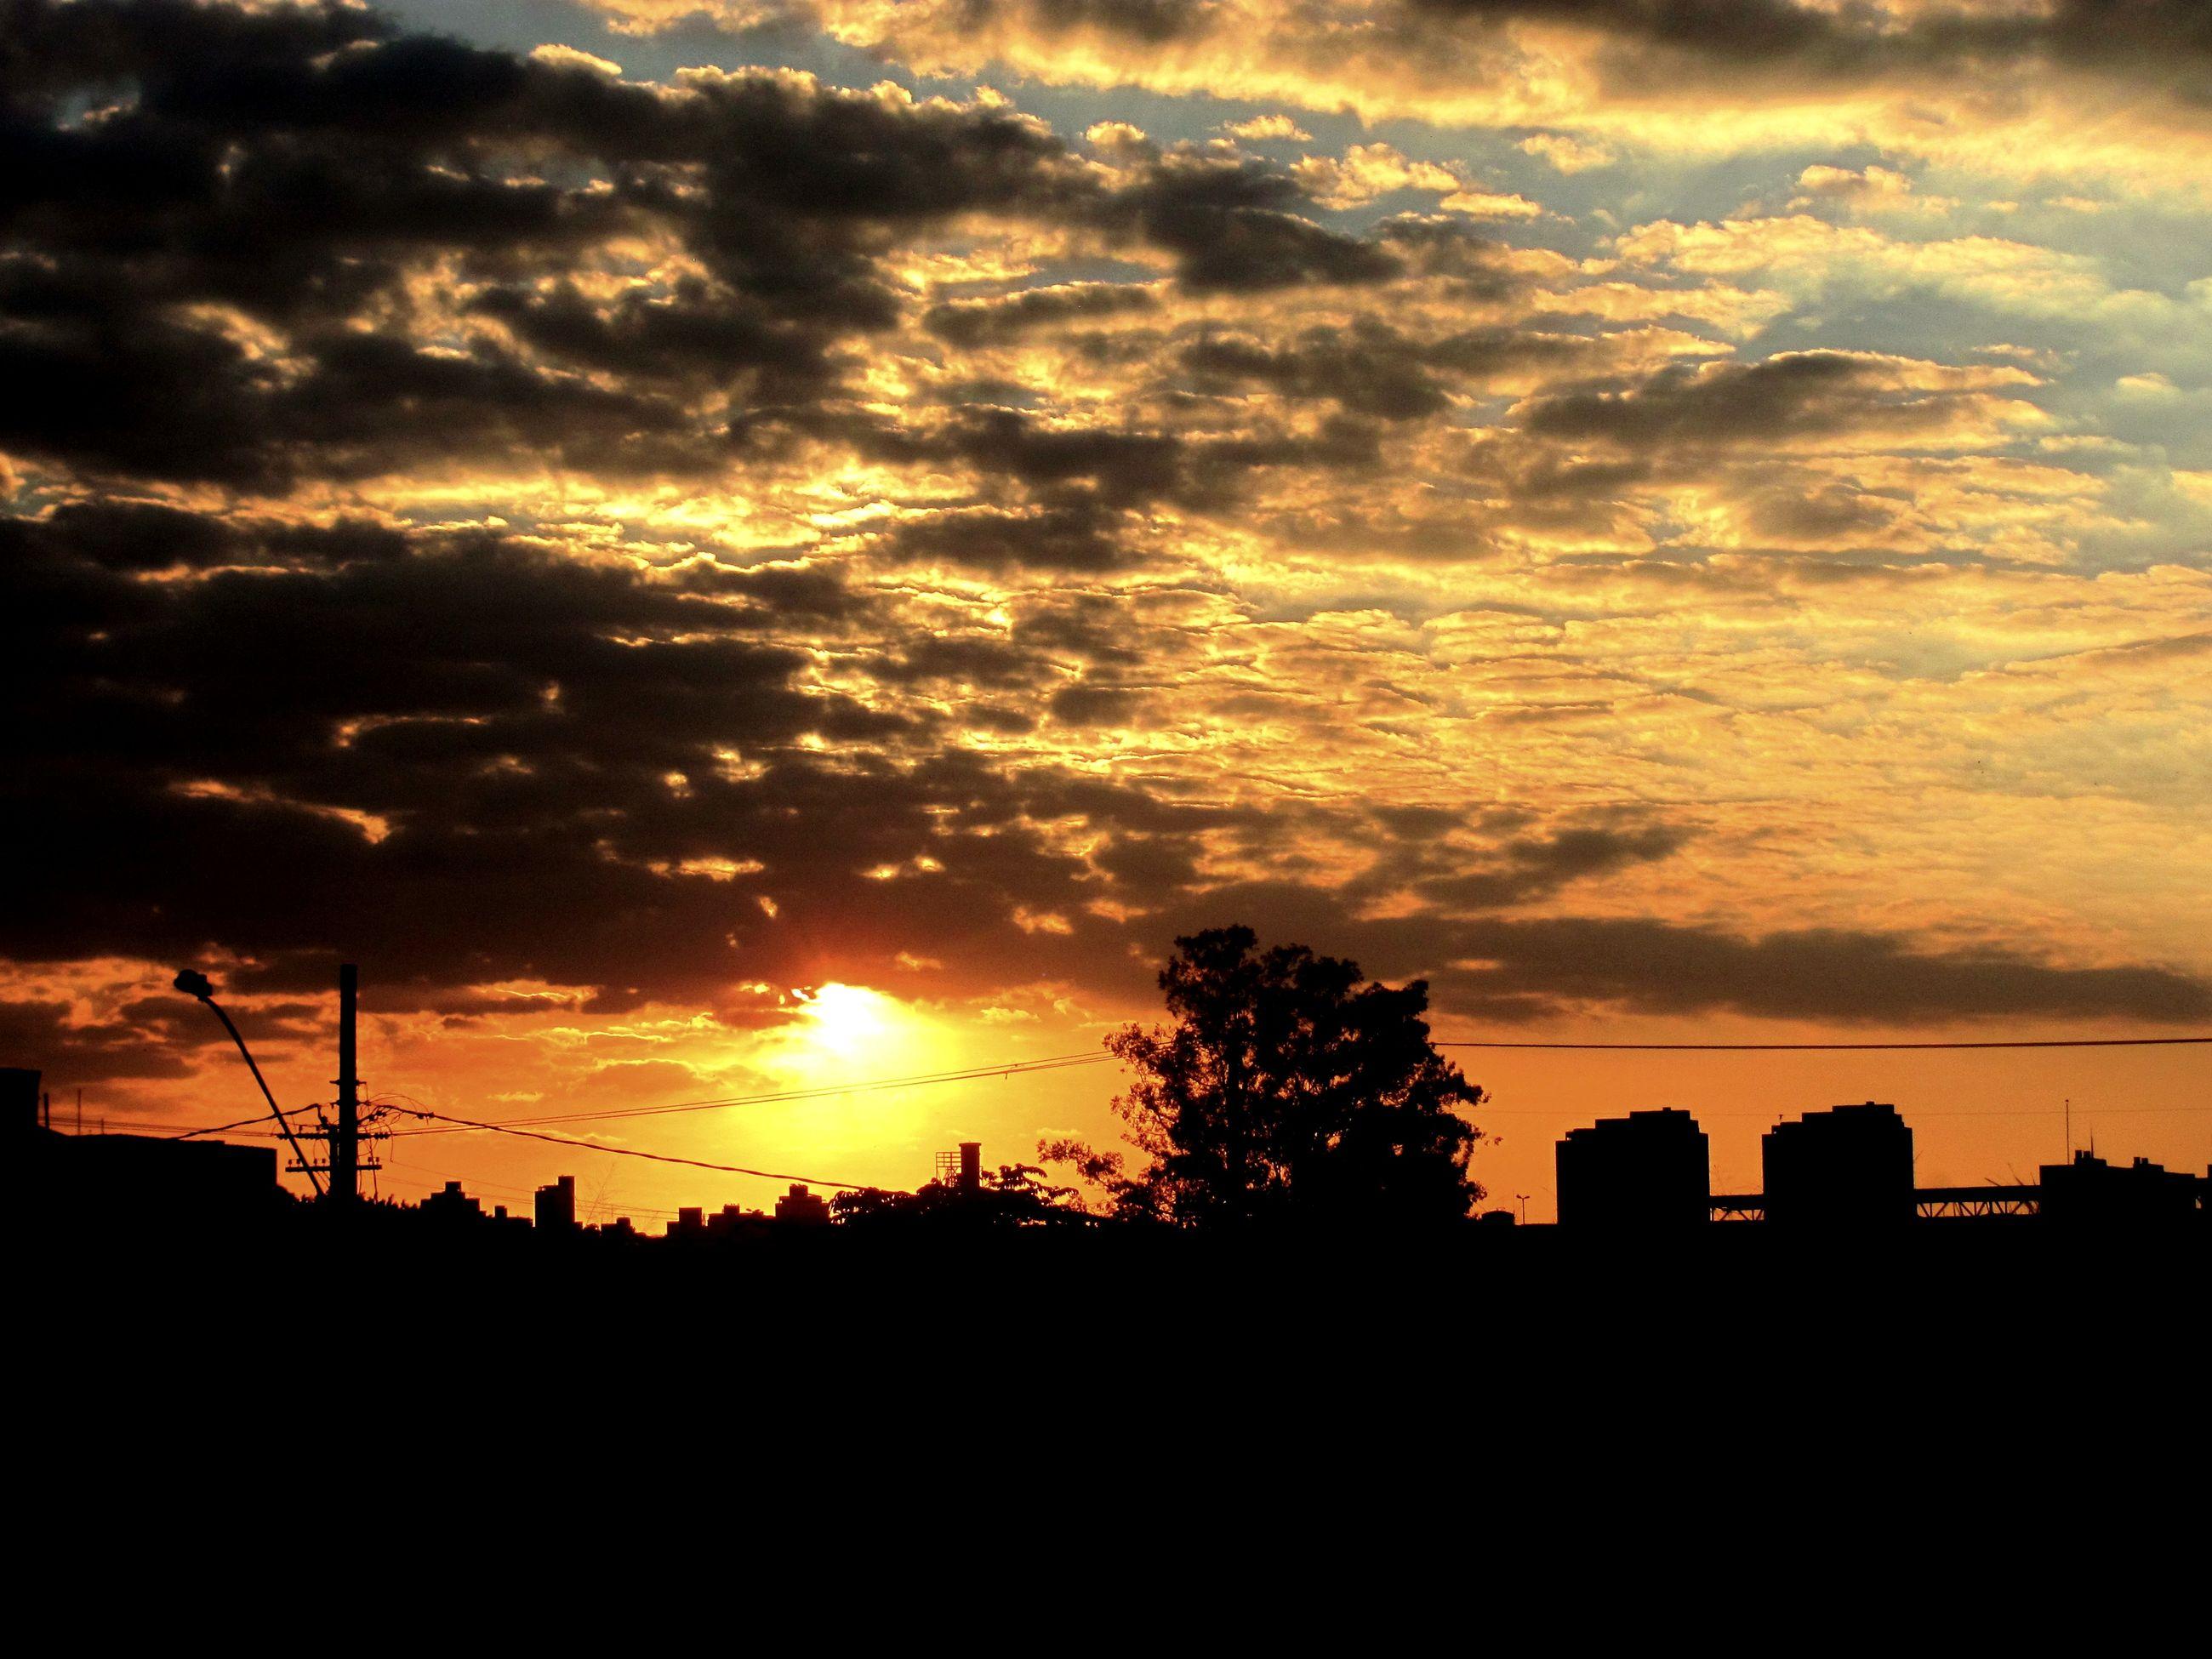 sunset, silhouette, sky, orange color, beauty in nature, tree, nature, cloud - sky, sun, scenics, no people, outdoors, landscape, technology, electricity pylon